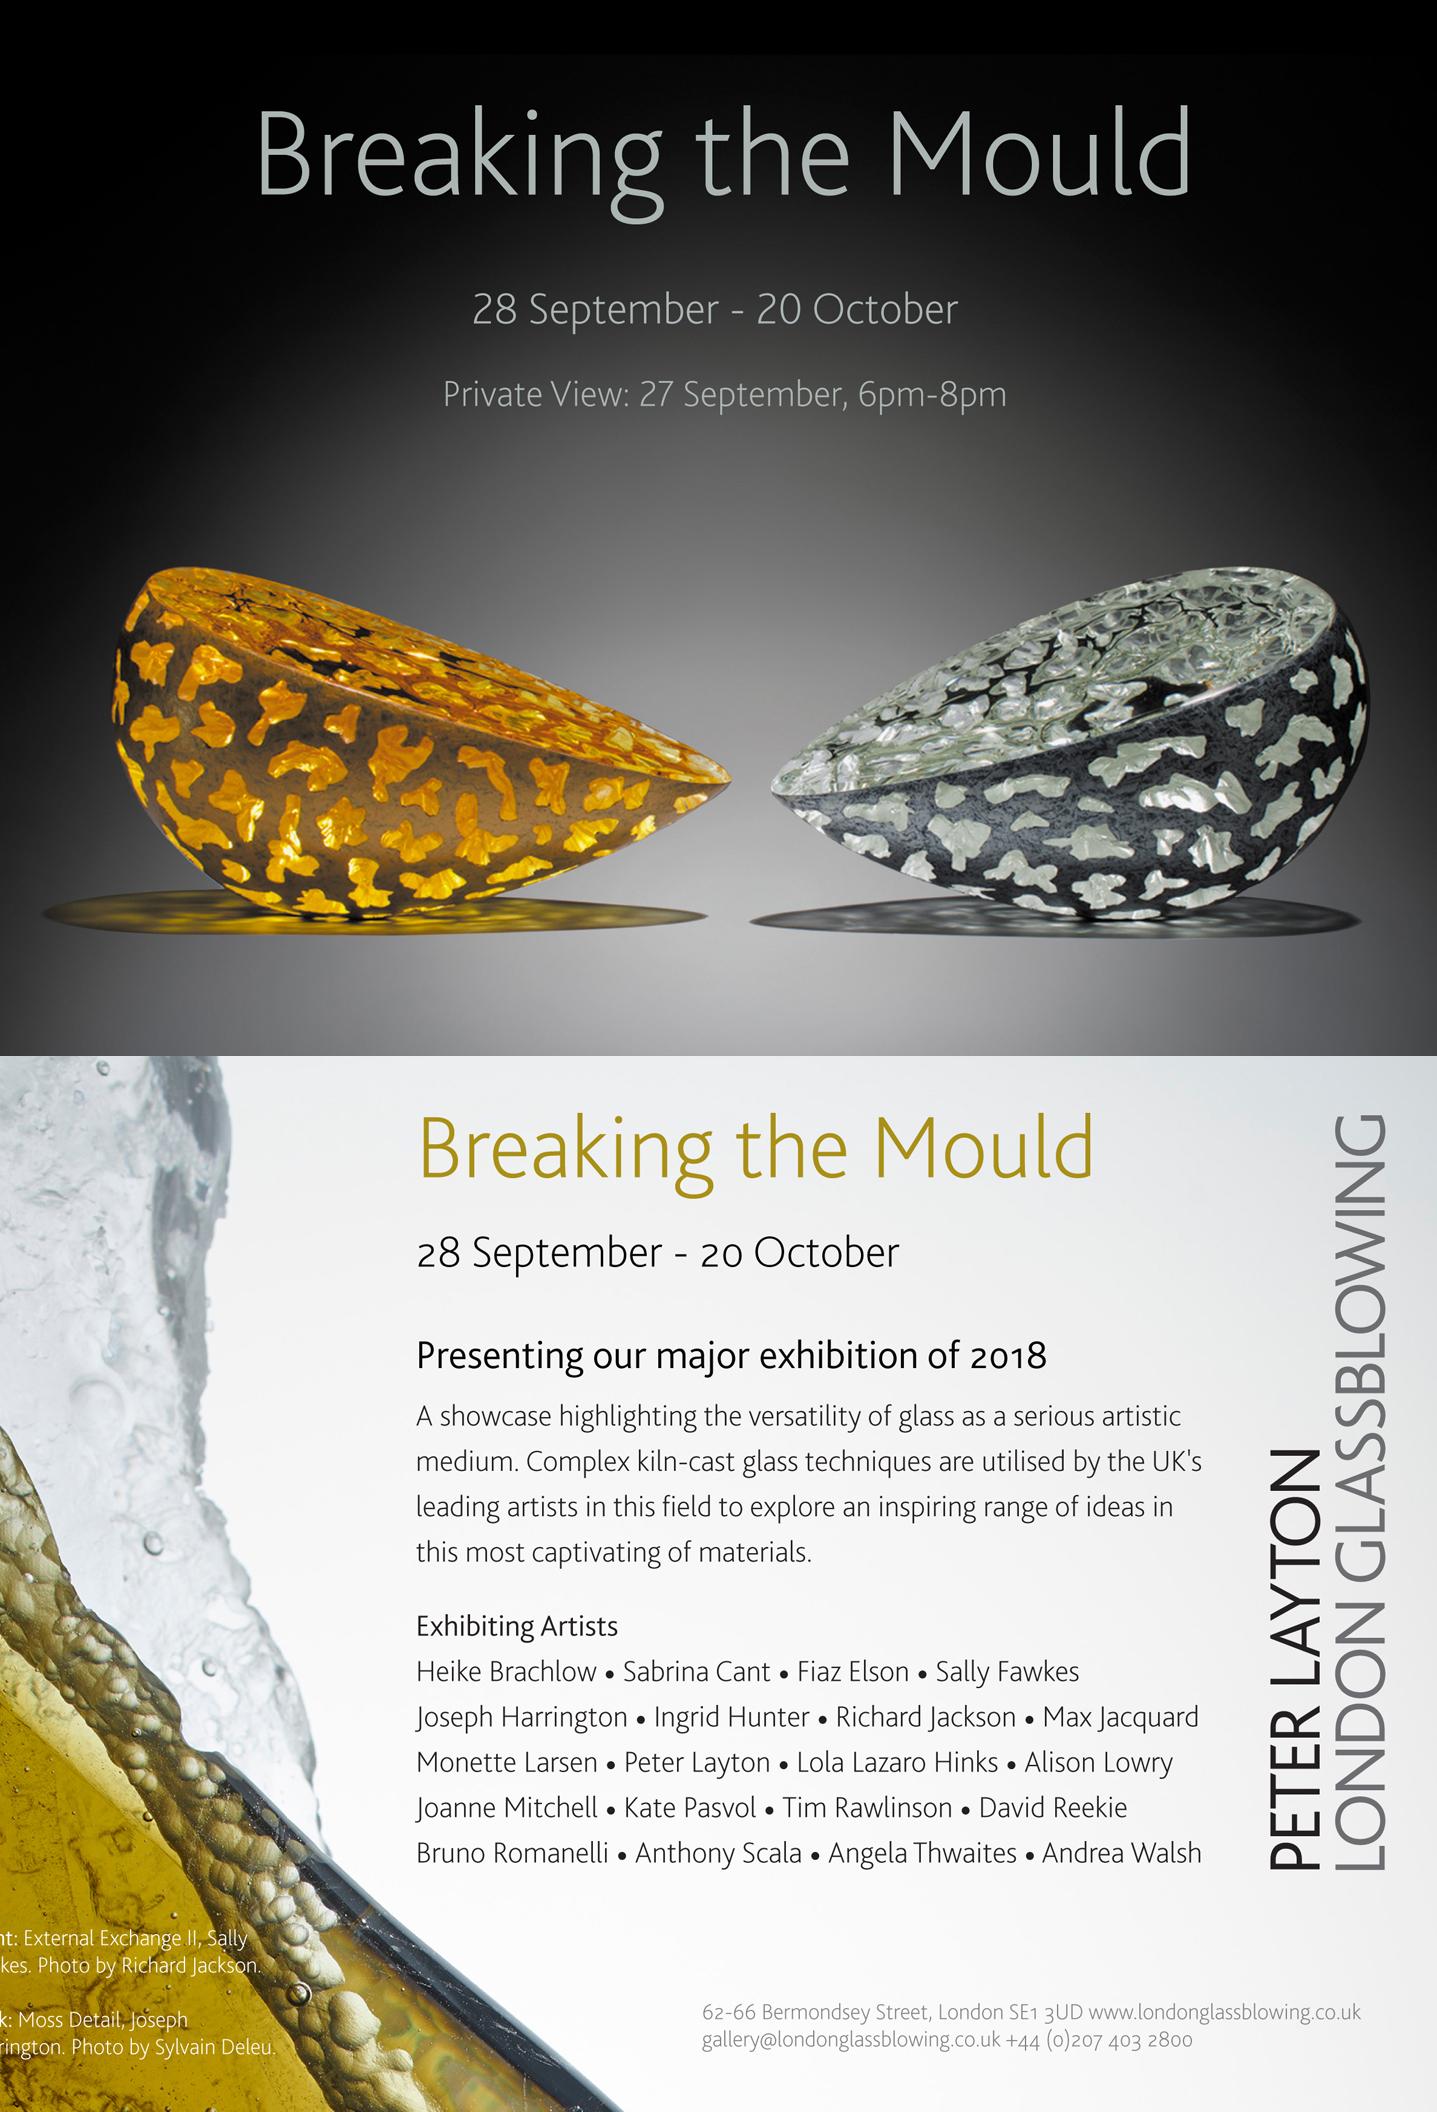 Breaking the Mould PV Invitation.jpg